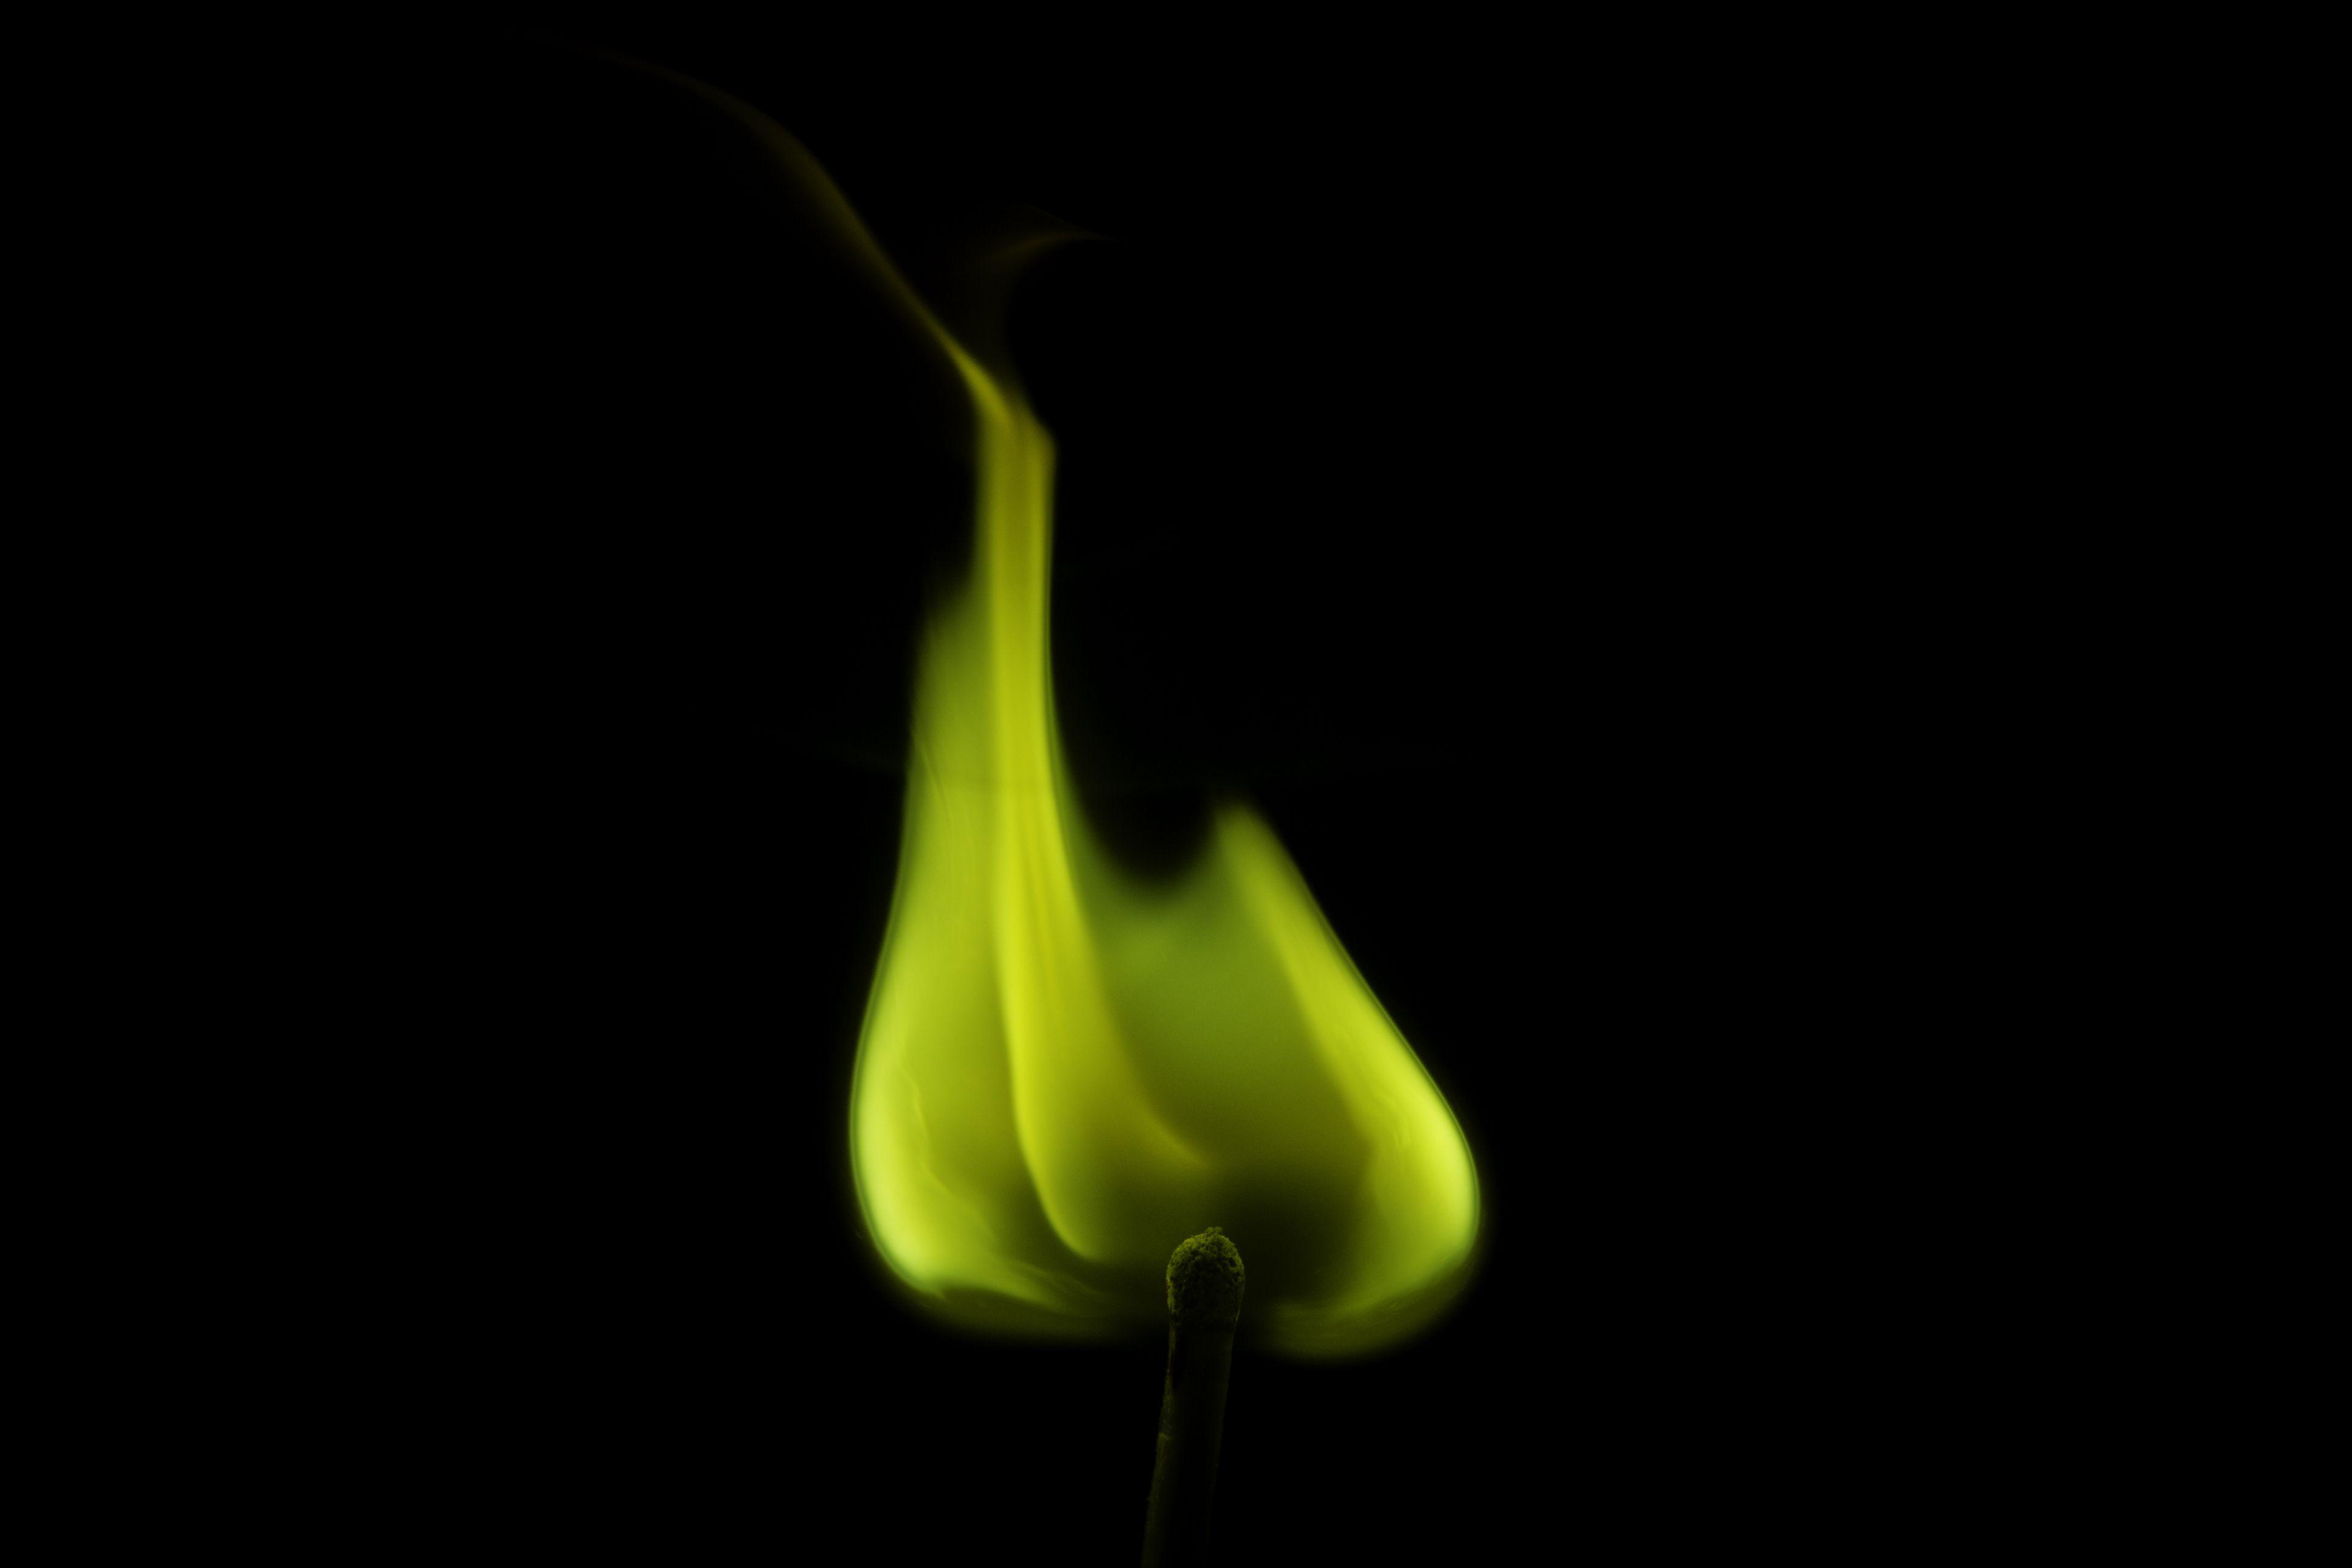 Barium salts produce a yellow-green flame